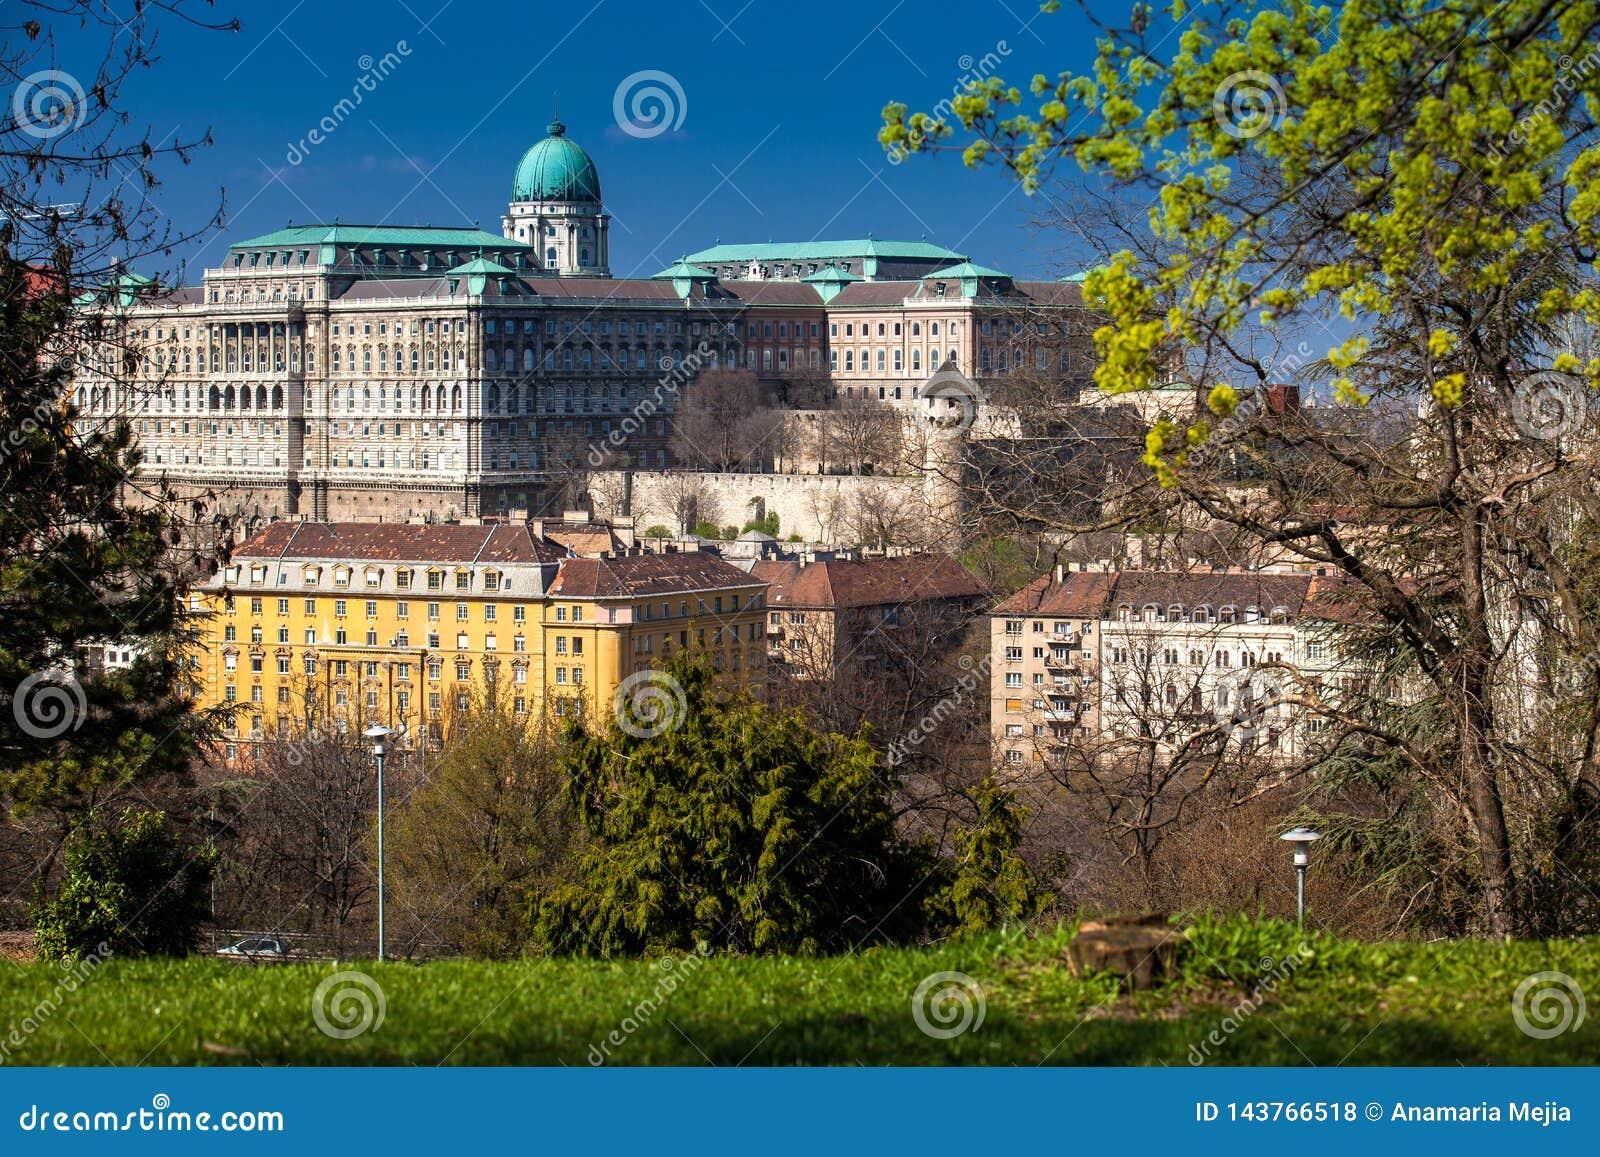 Buda Castle seen from the Garden of Philosophy